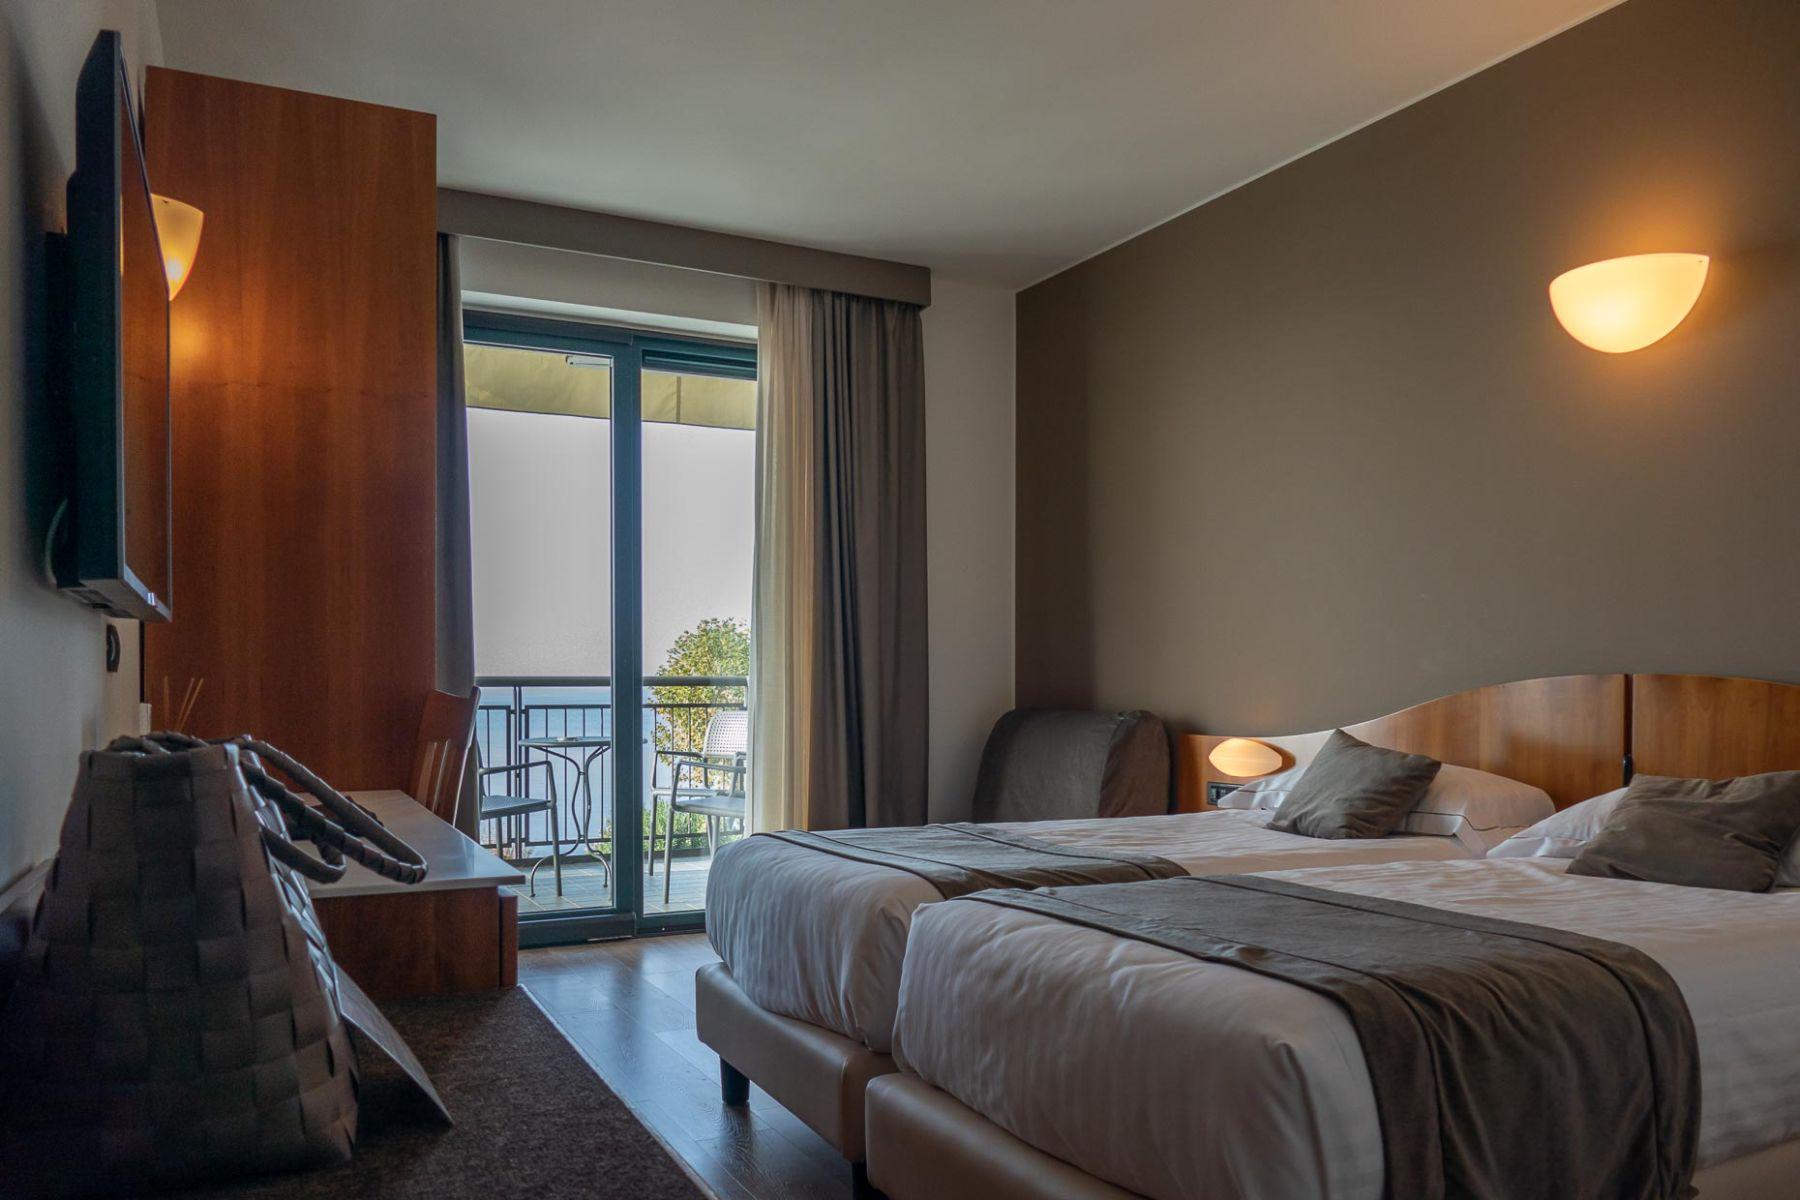 Gallery Hotel Bardolino